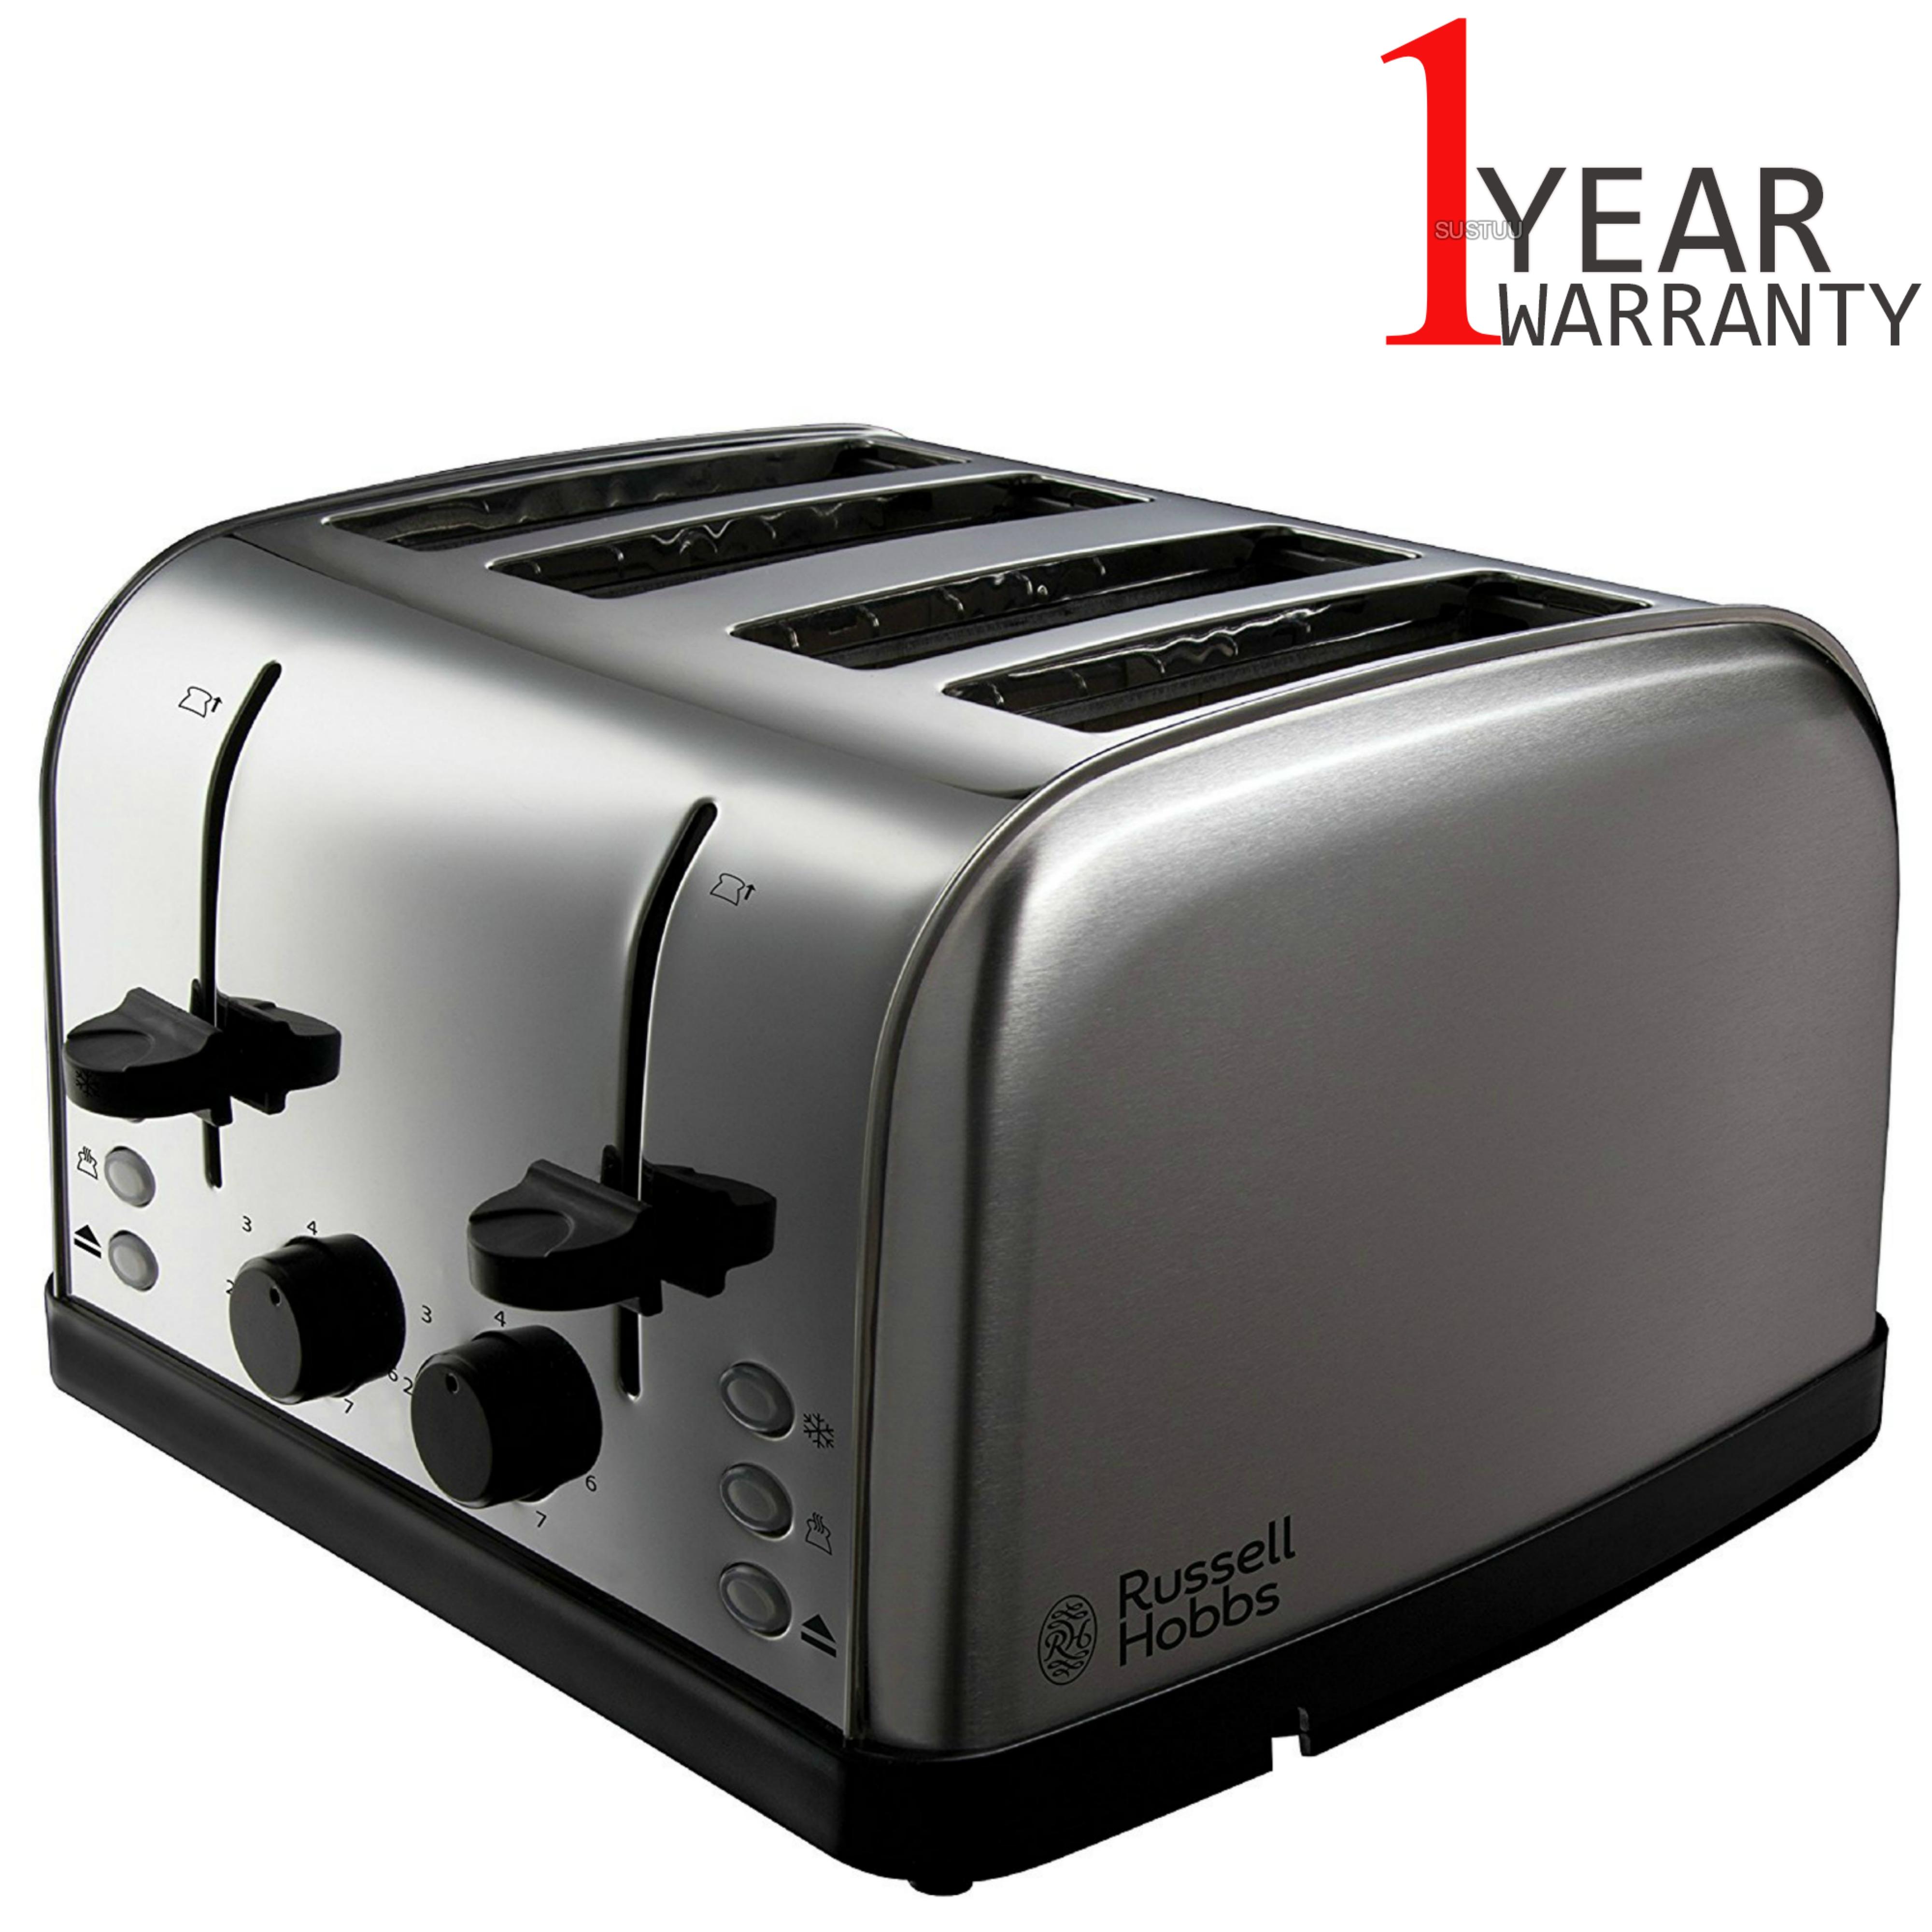 Russell Hobbs 18790 4-Slice Futura Toaster | Frozen Bread Function | Stainless Steel